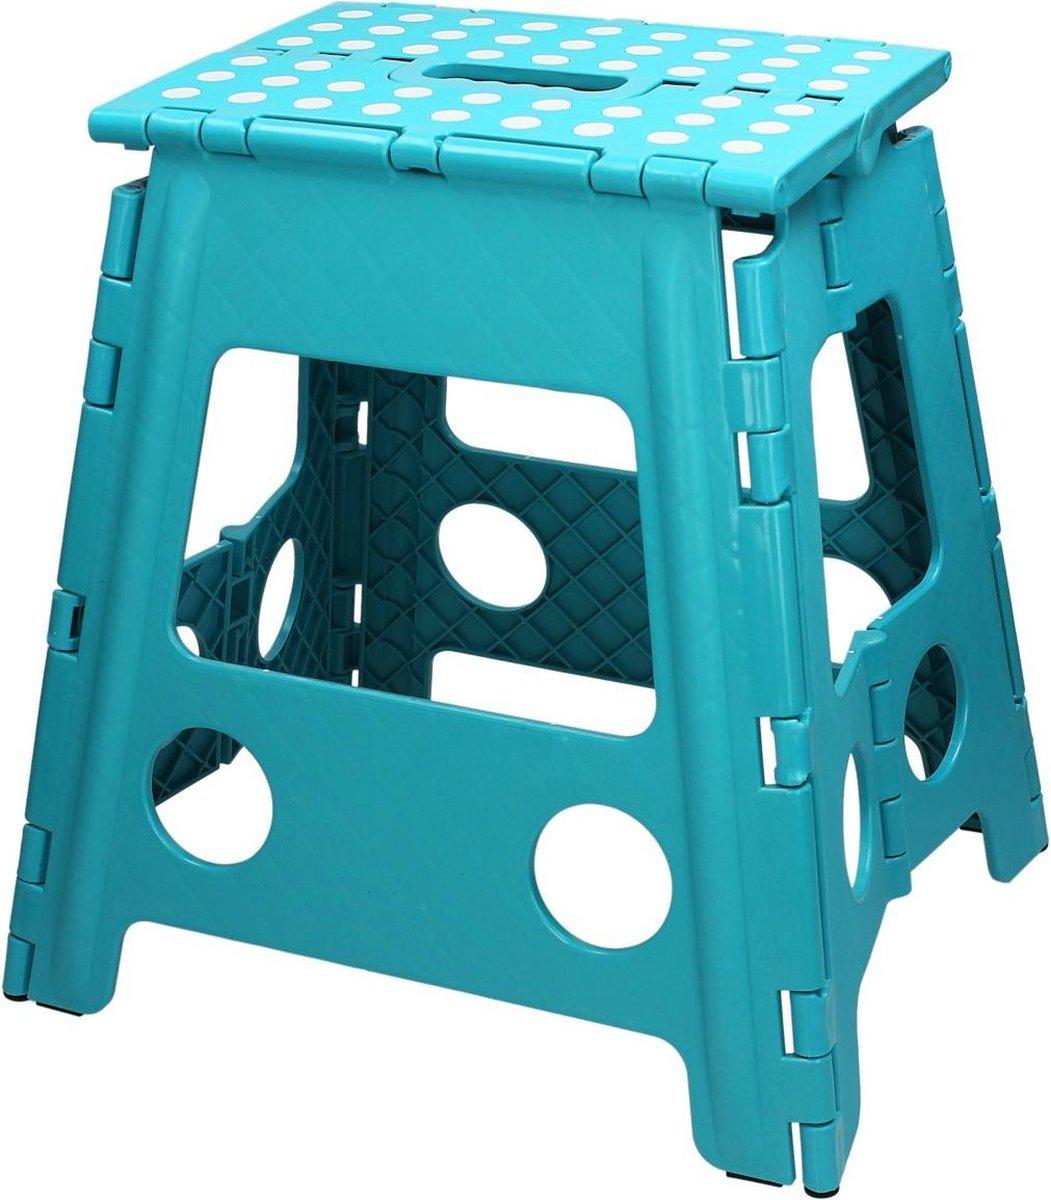 Qhp Opstapkrukje Step-up  - Turquoise